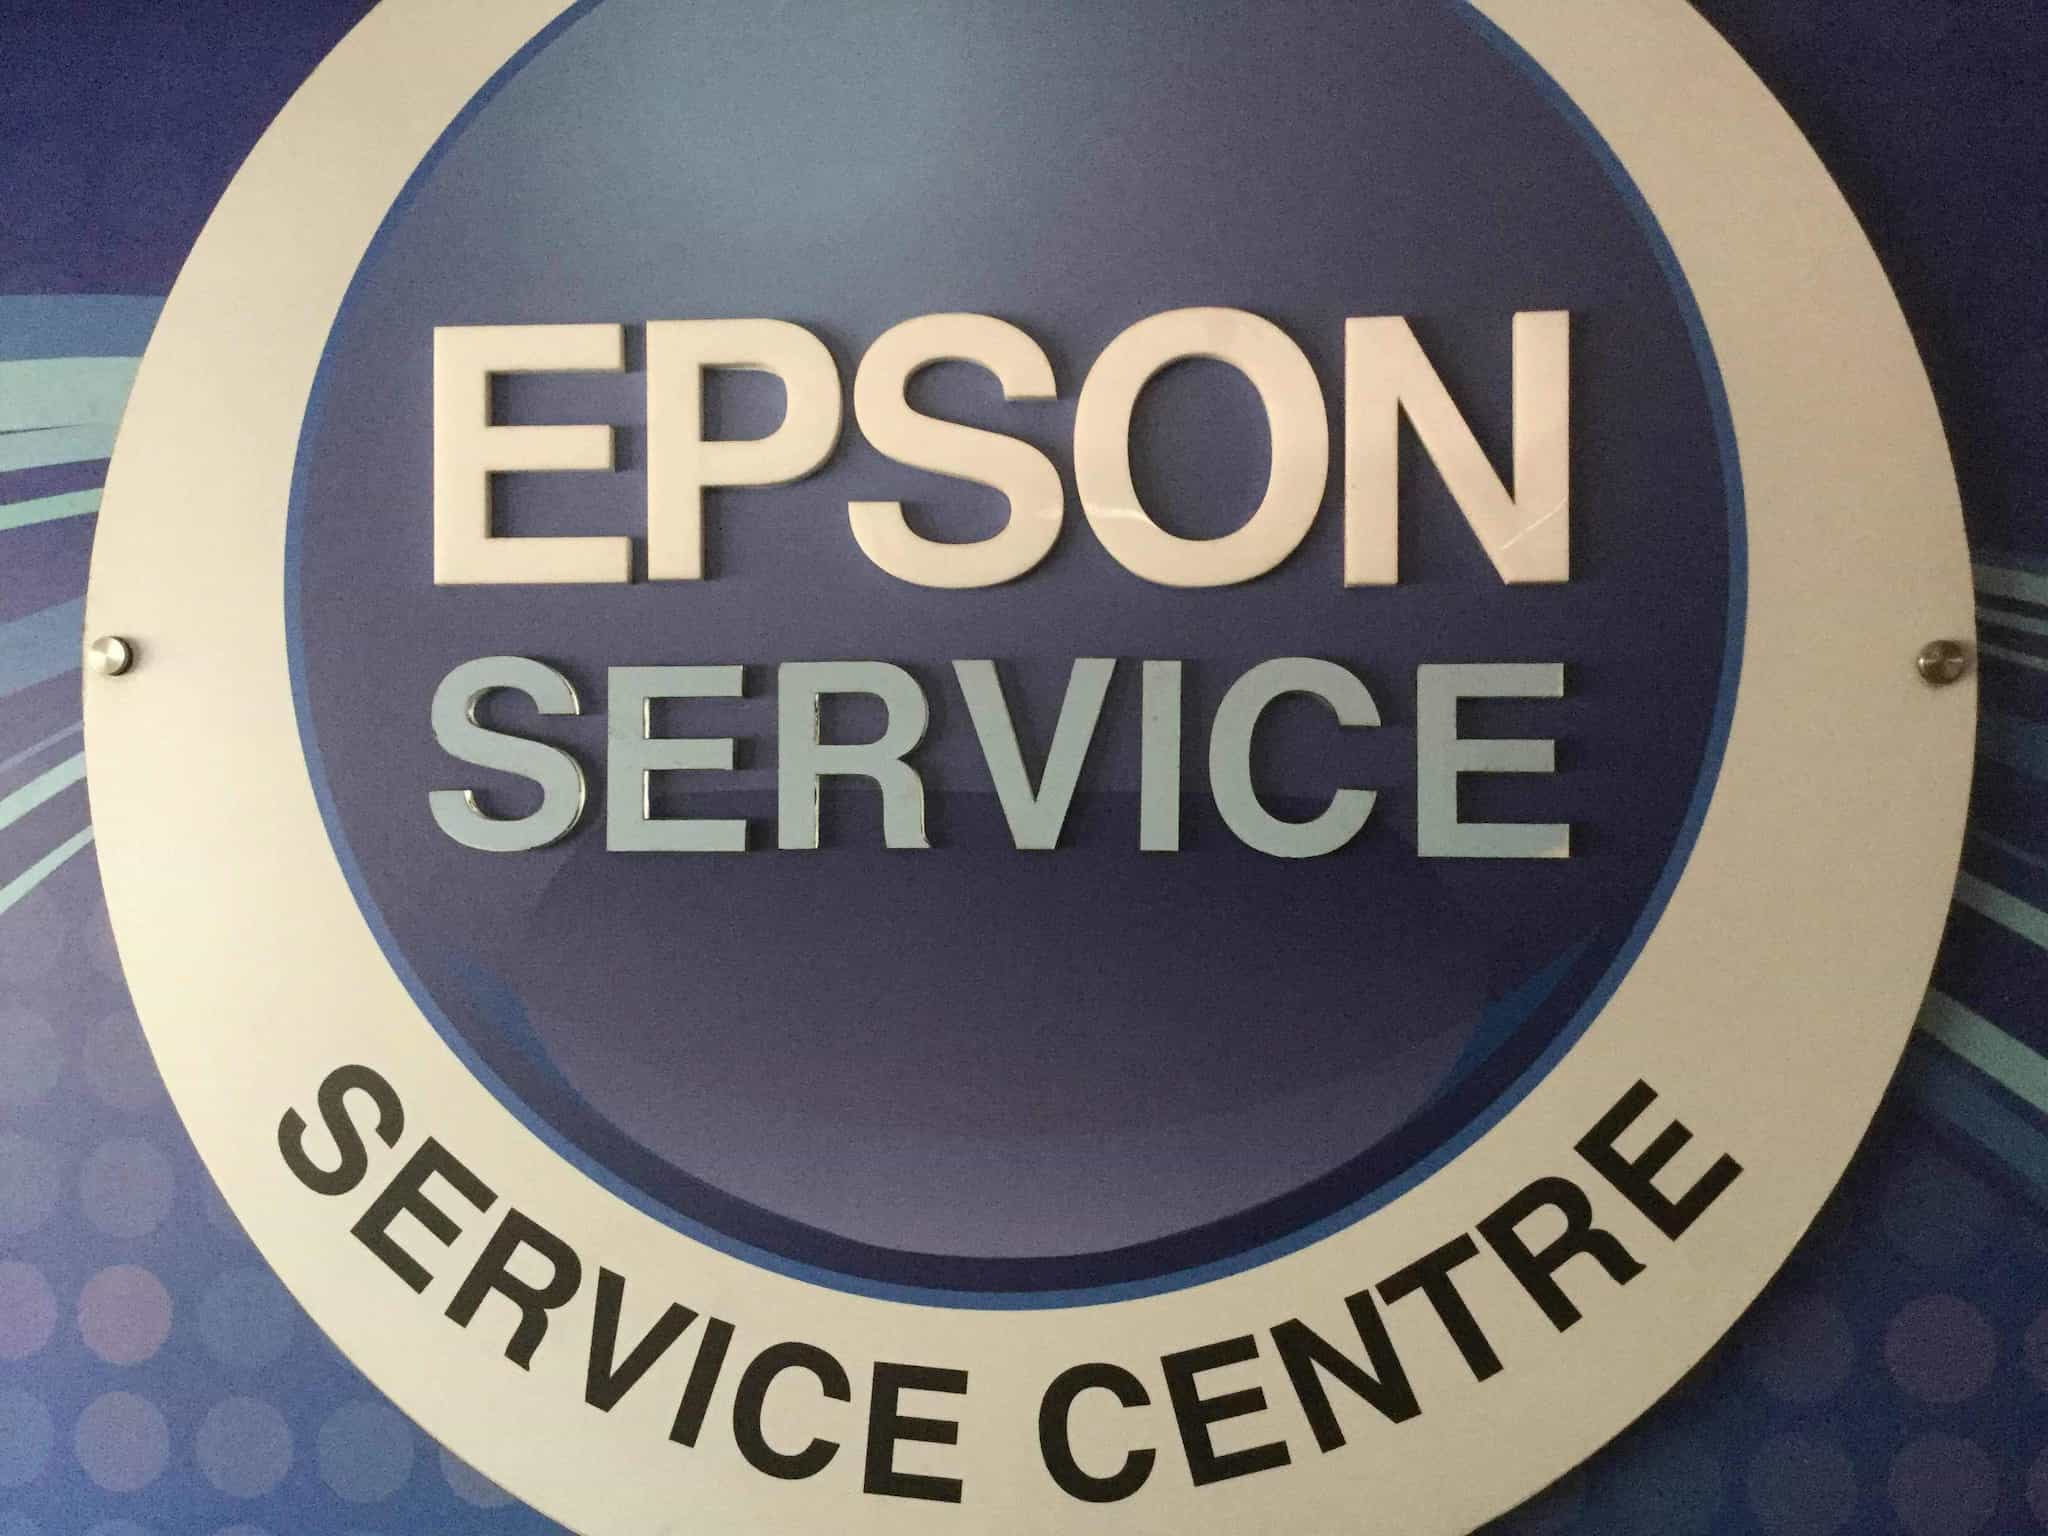 Epson (service Center), Kadri - Computer Printer Repair